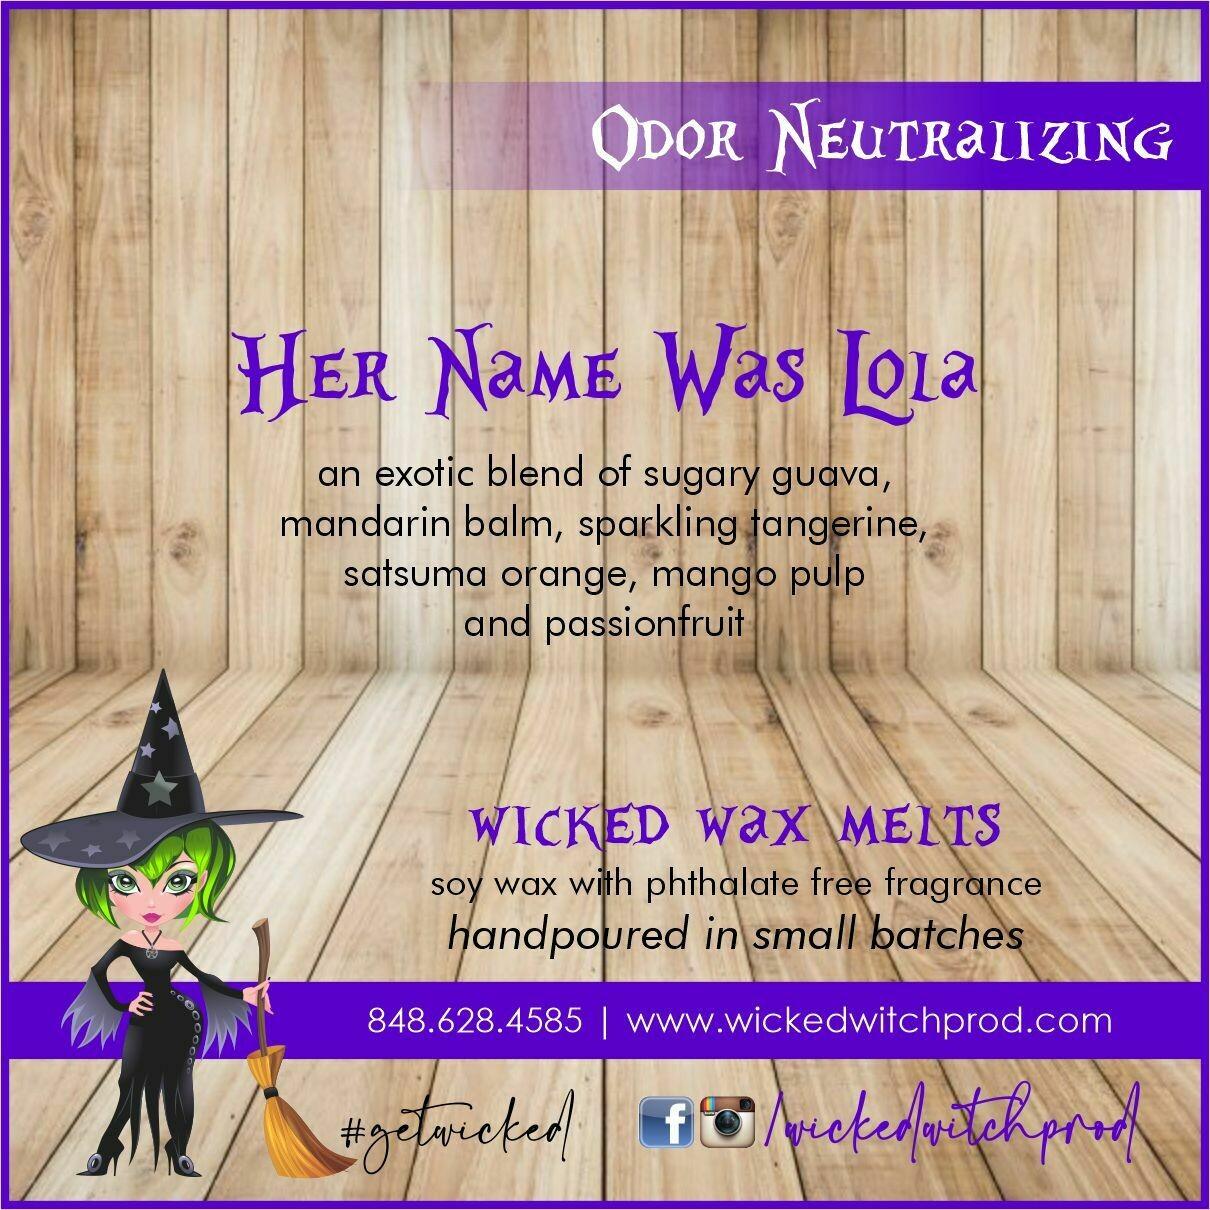 Her Name Was Lola Odor Neutralizing Wax Melt